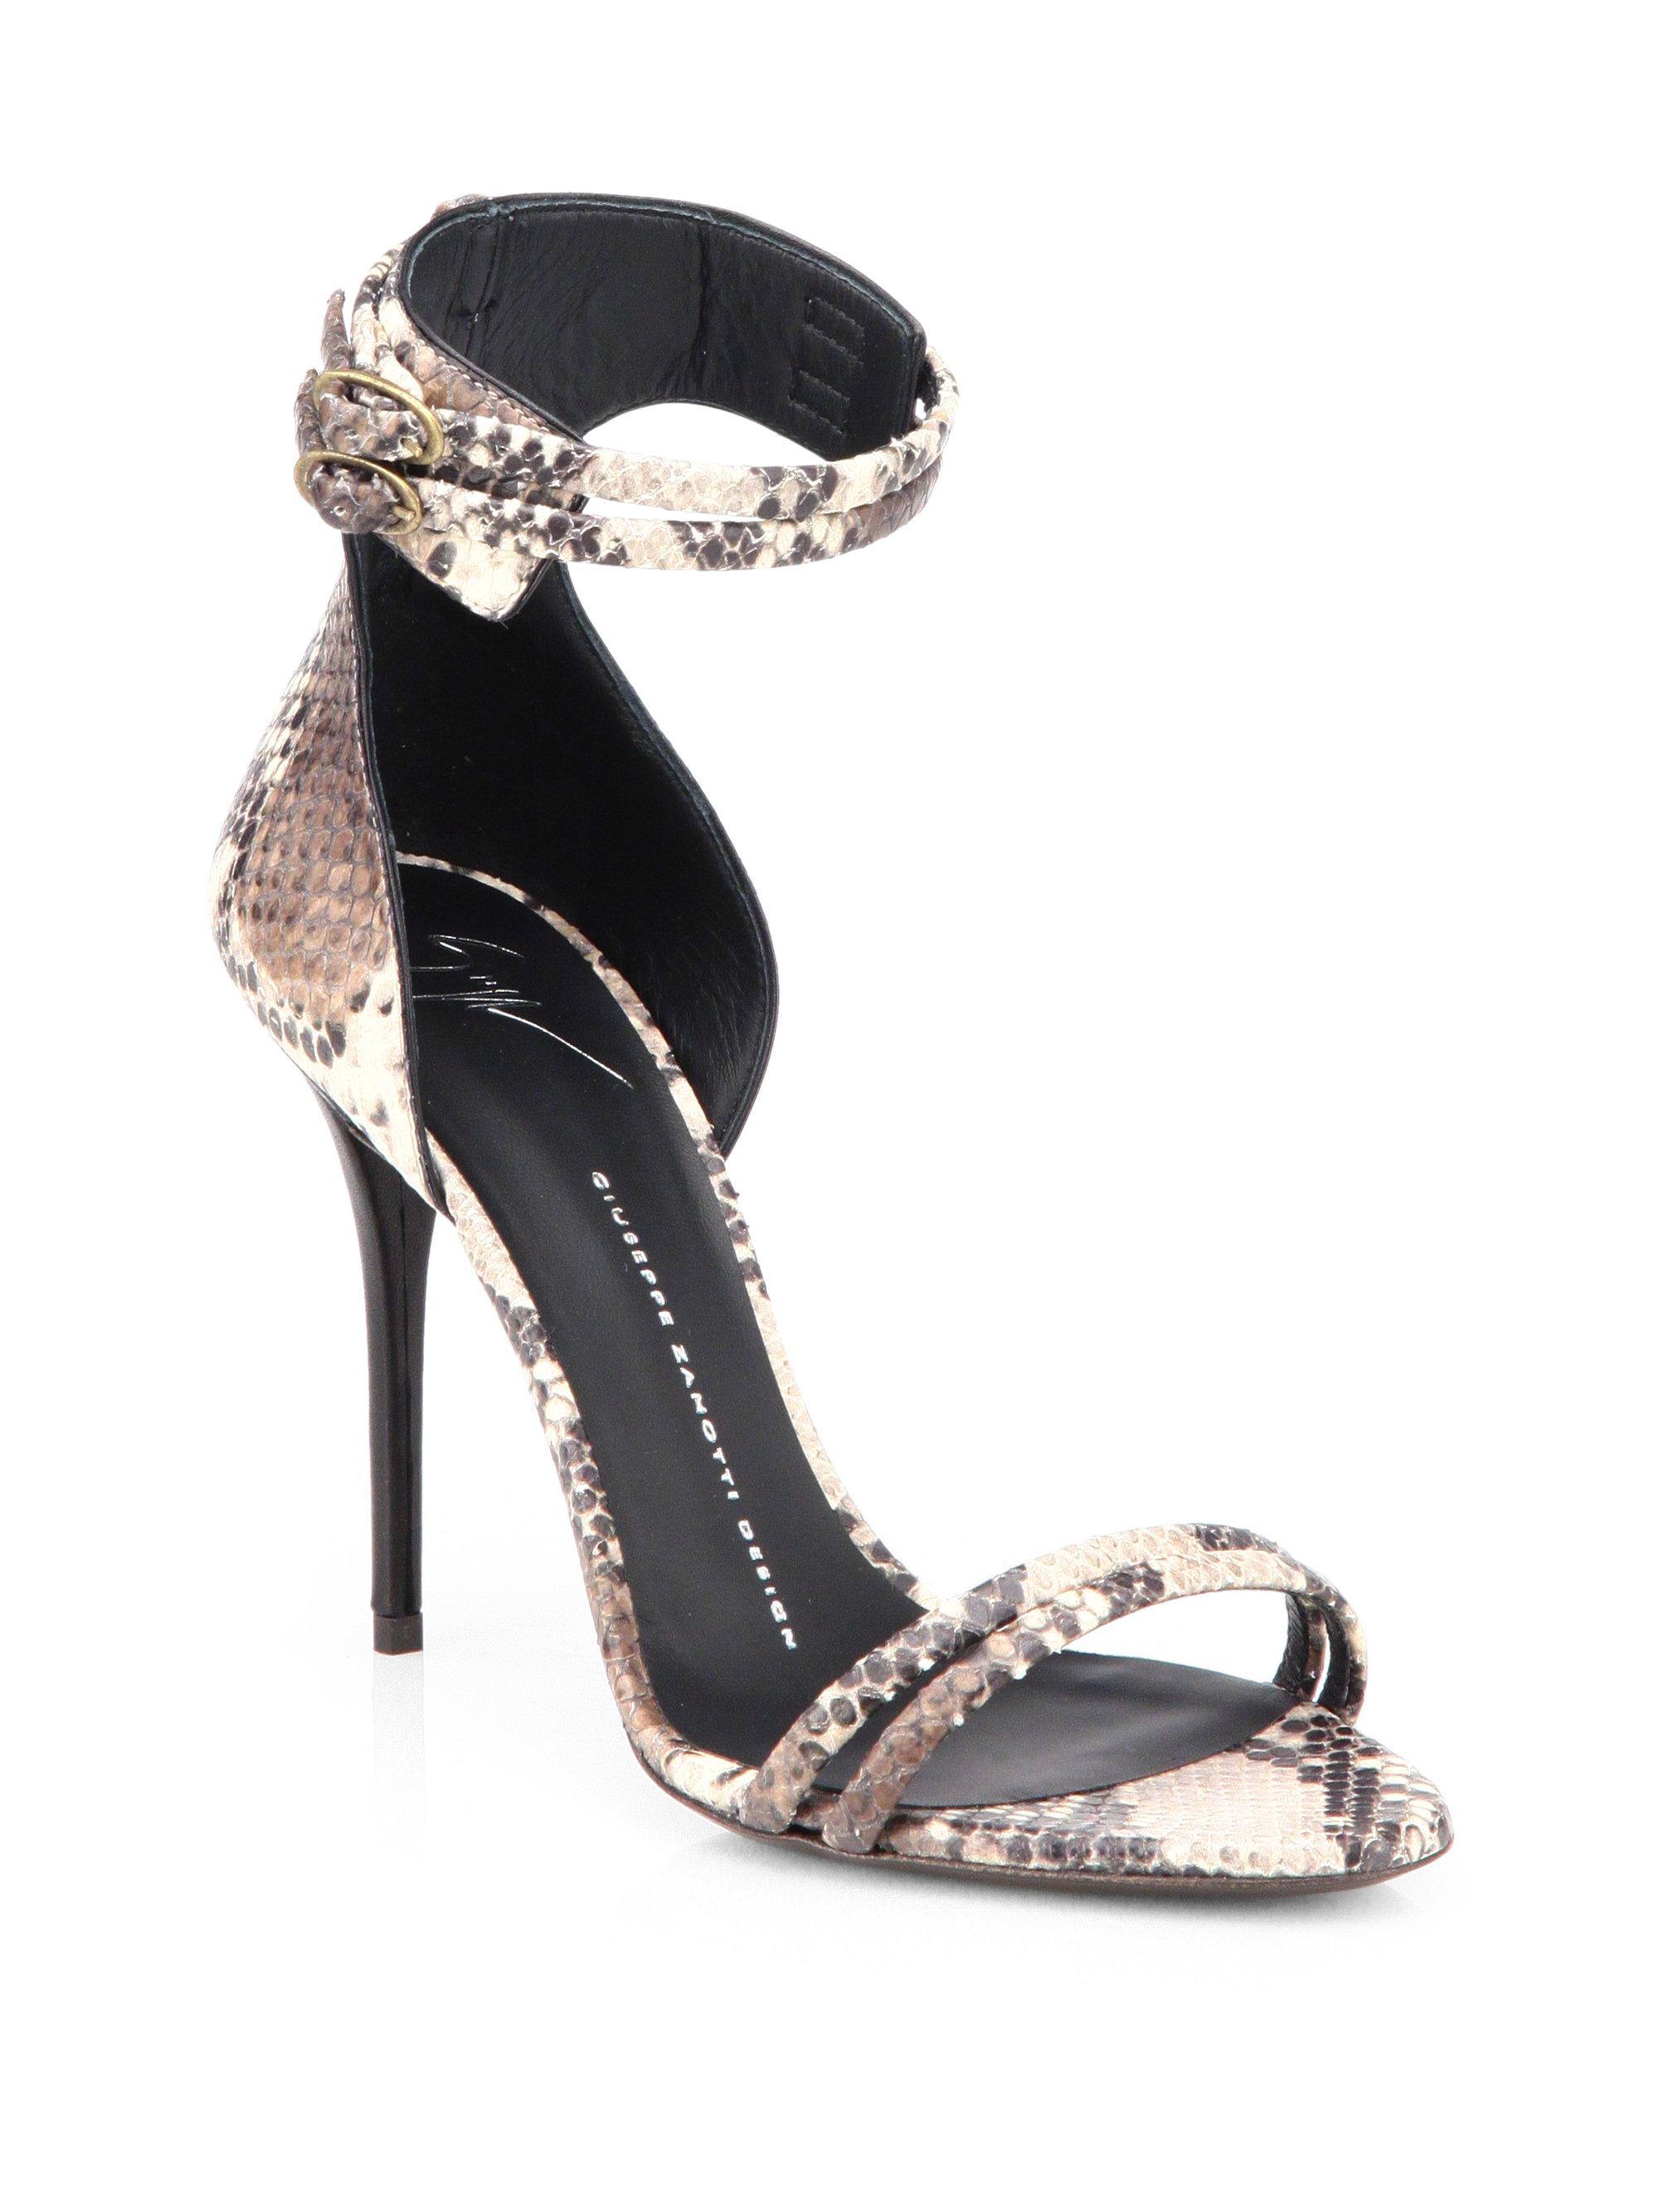 ef9e9ccb81bb0 Lyst - Giuseppe Zanotti Python Ankle Strap Sandals